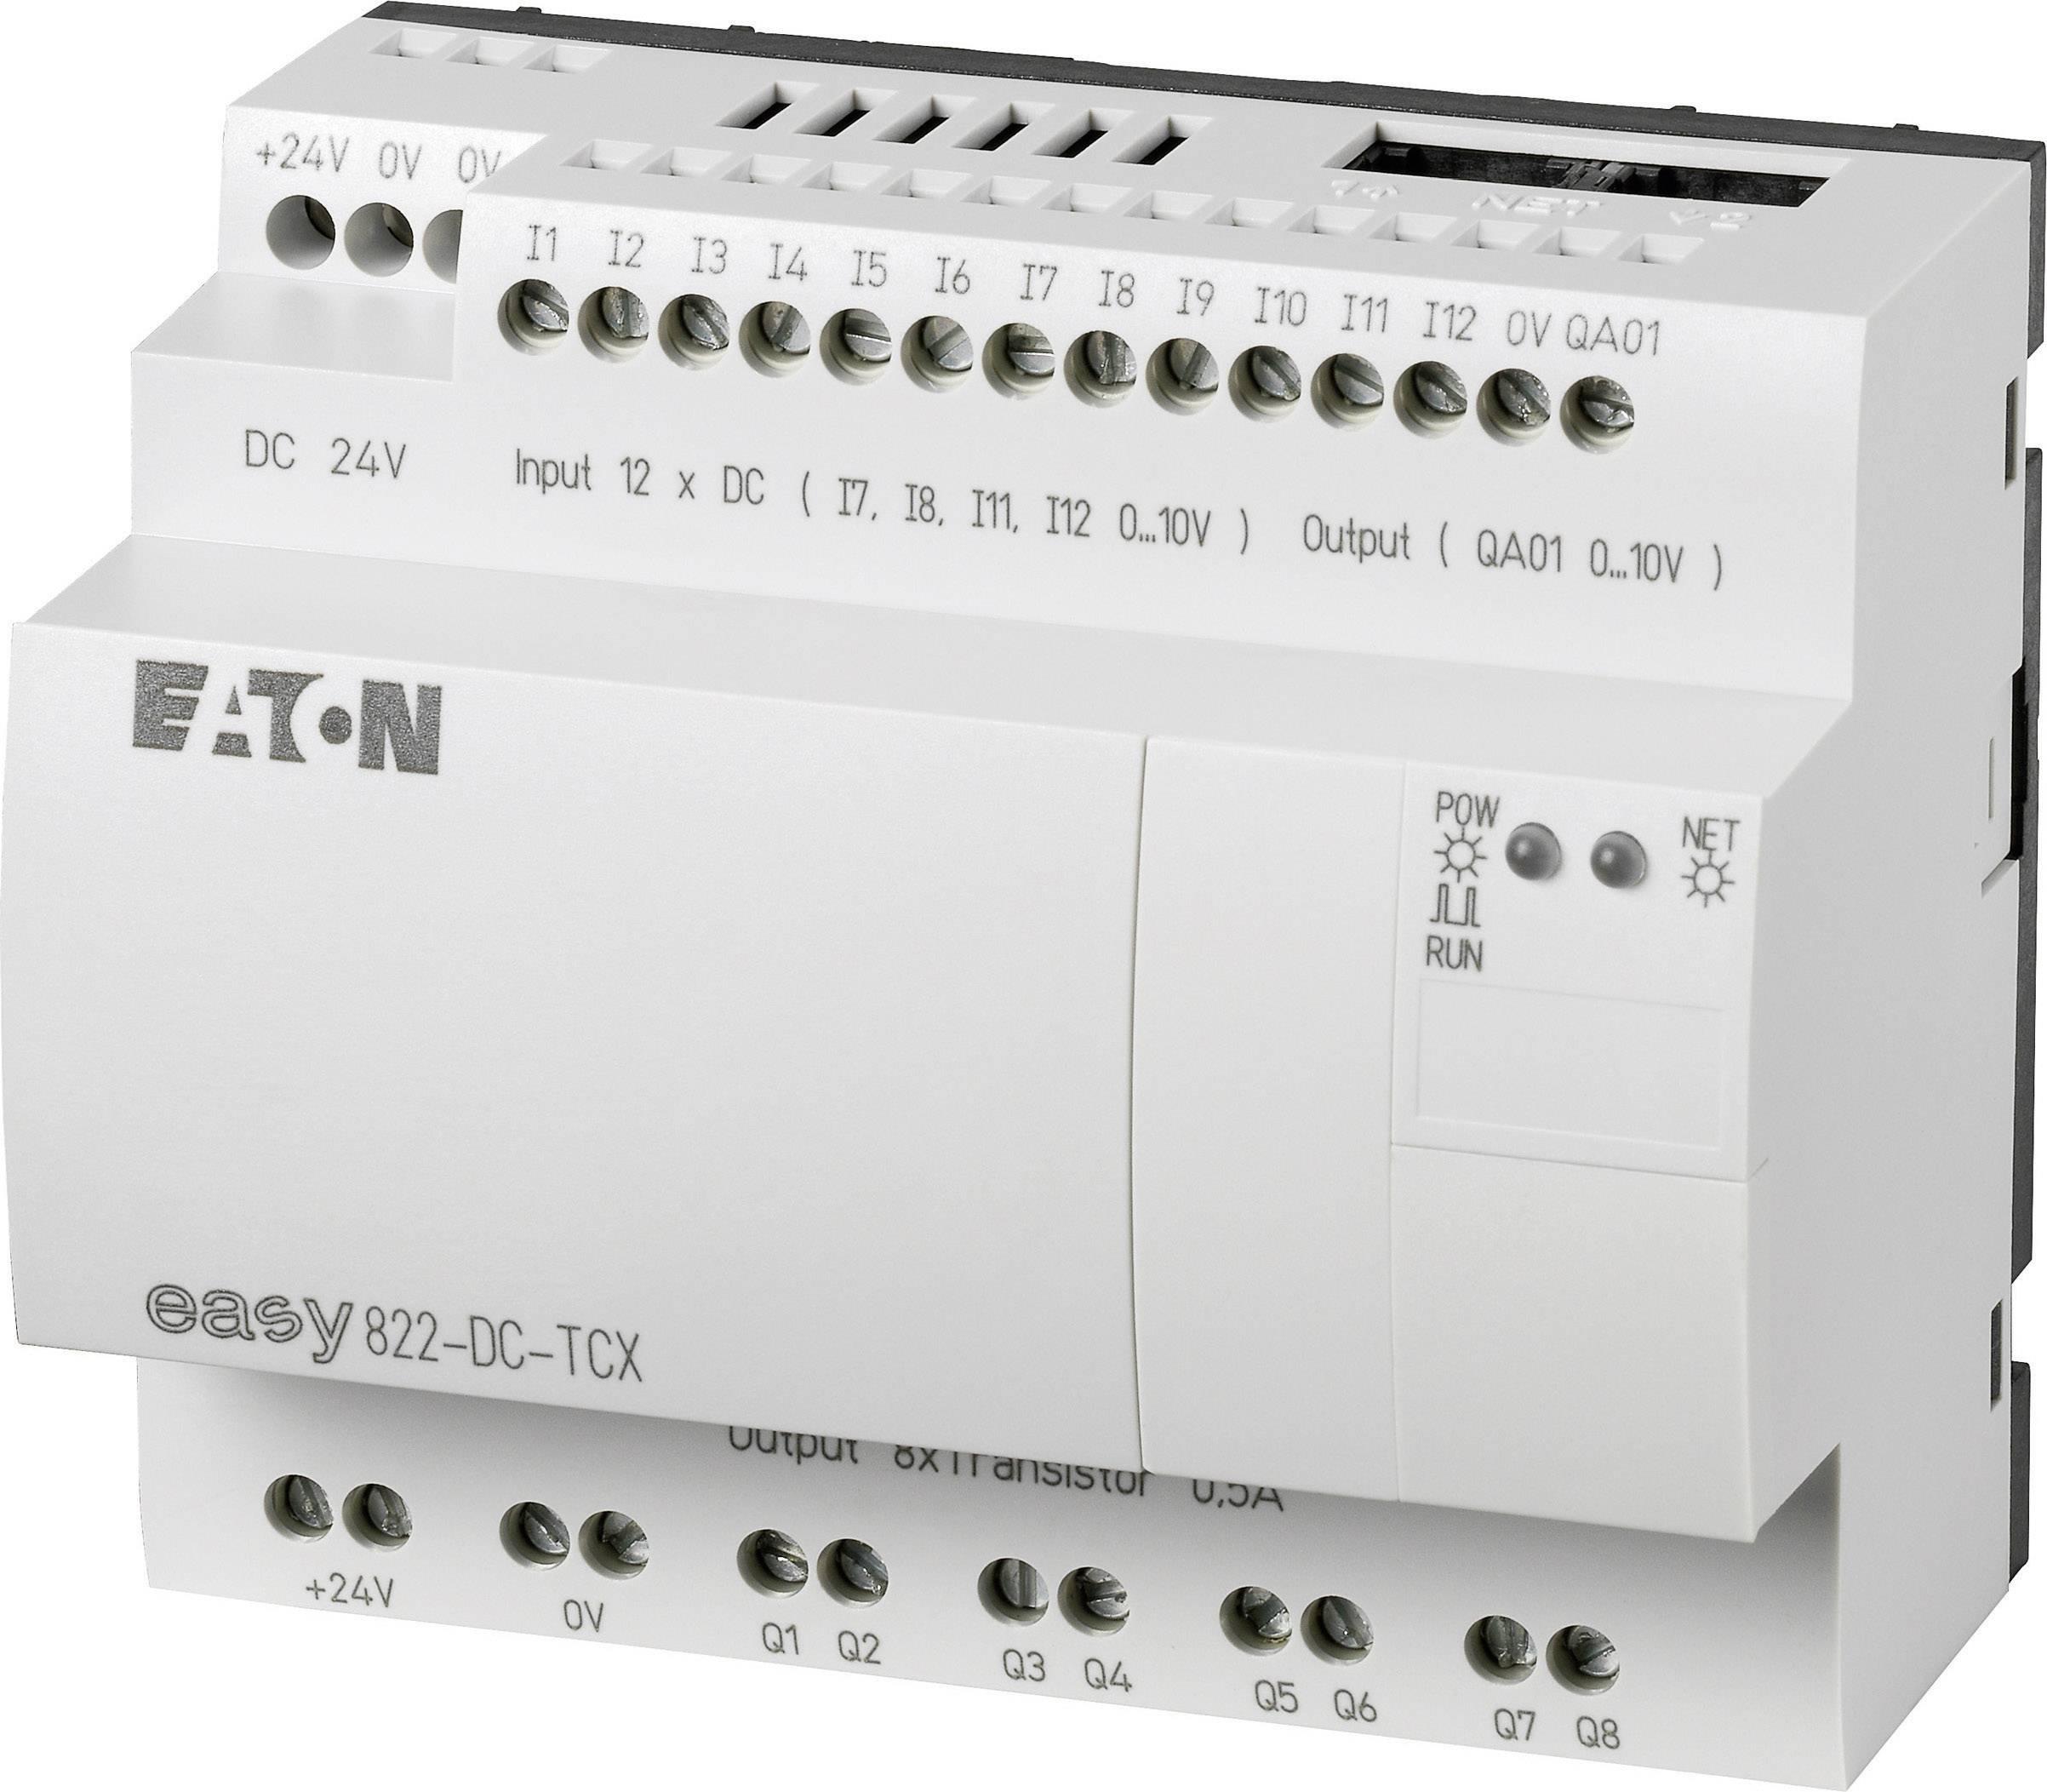 Řídicí reléový modul Eaton easy 822-DC-TCX (256276), IP20, 12, 8x tranzistor